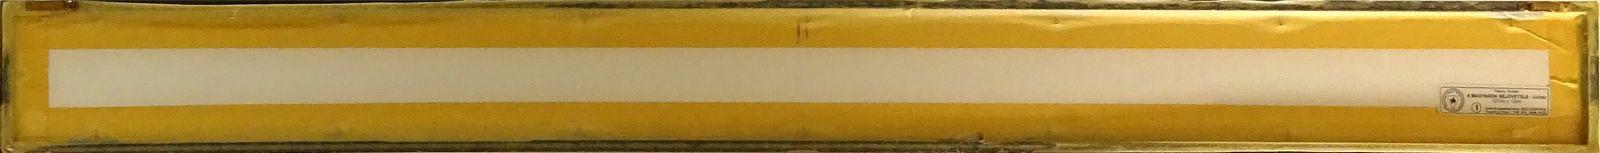 DSC04862.JPG (1600×153)